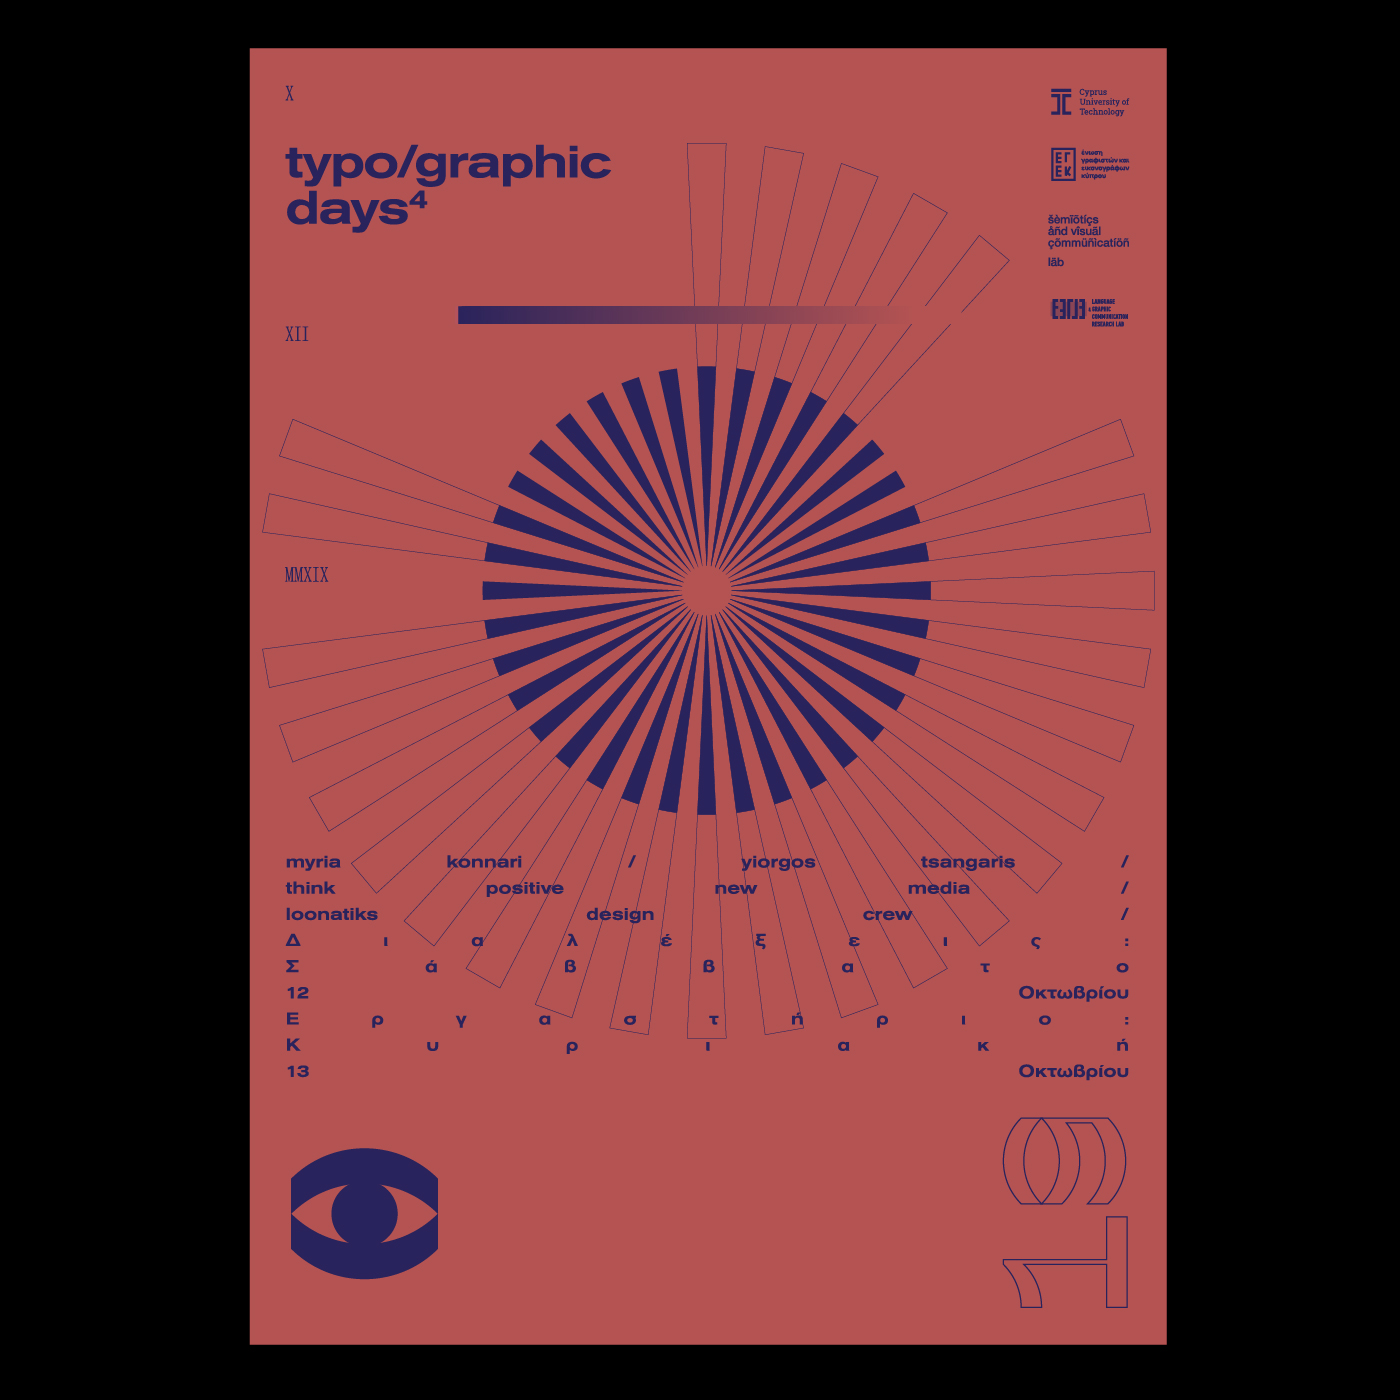 typo-graphic-days4-poster